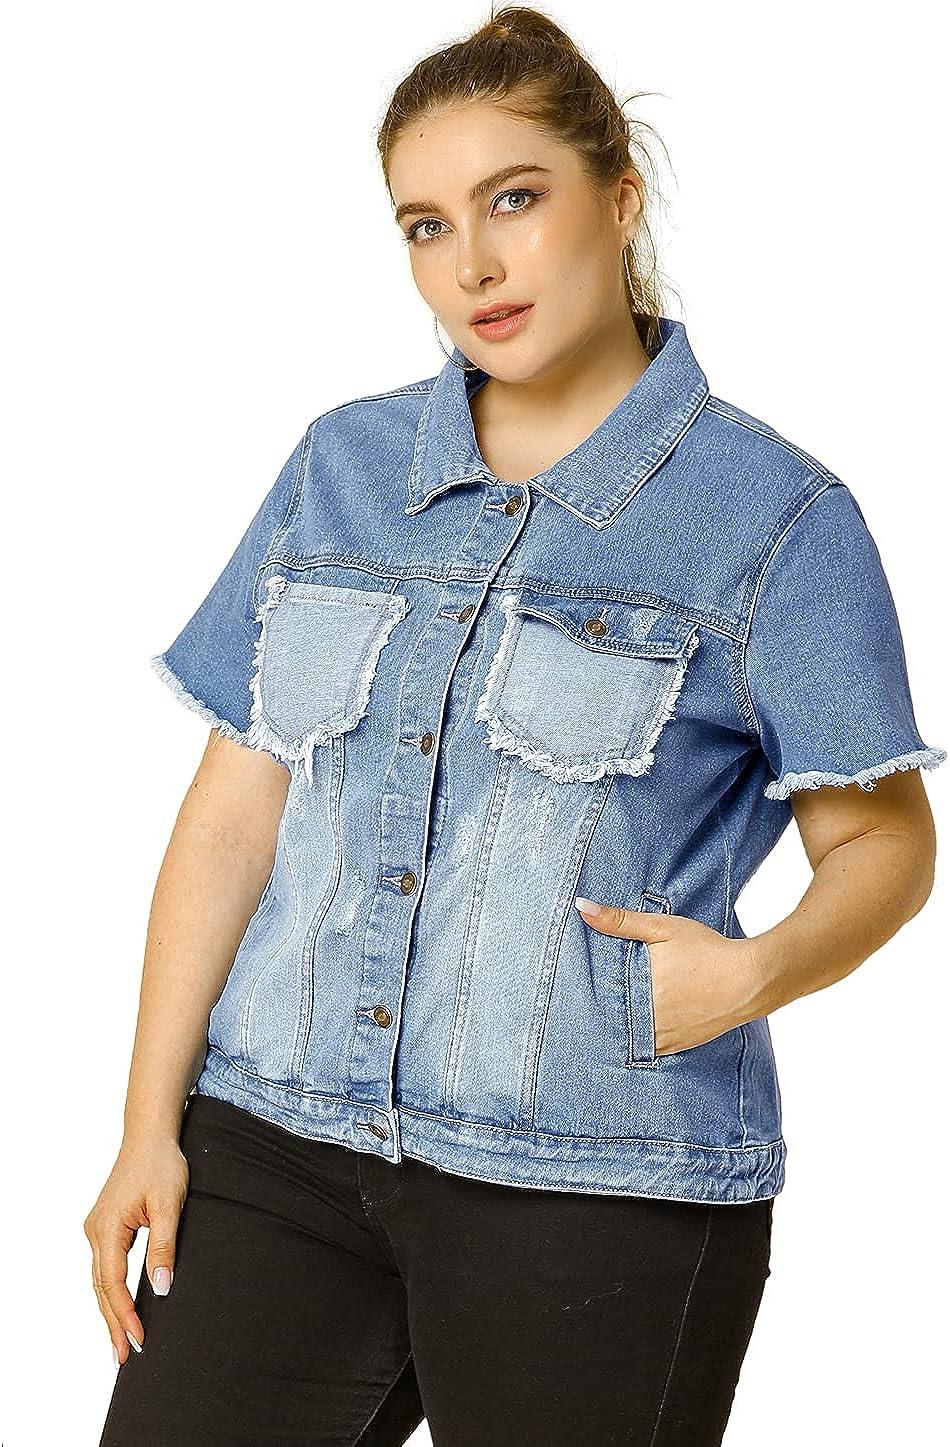 Agnes Orinda Women's Plus Size Jean Vest Short Sleeve Washed Frayed Denim Jacket with Chest Flap Pocket